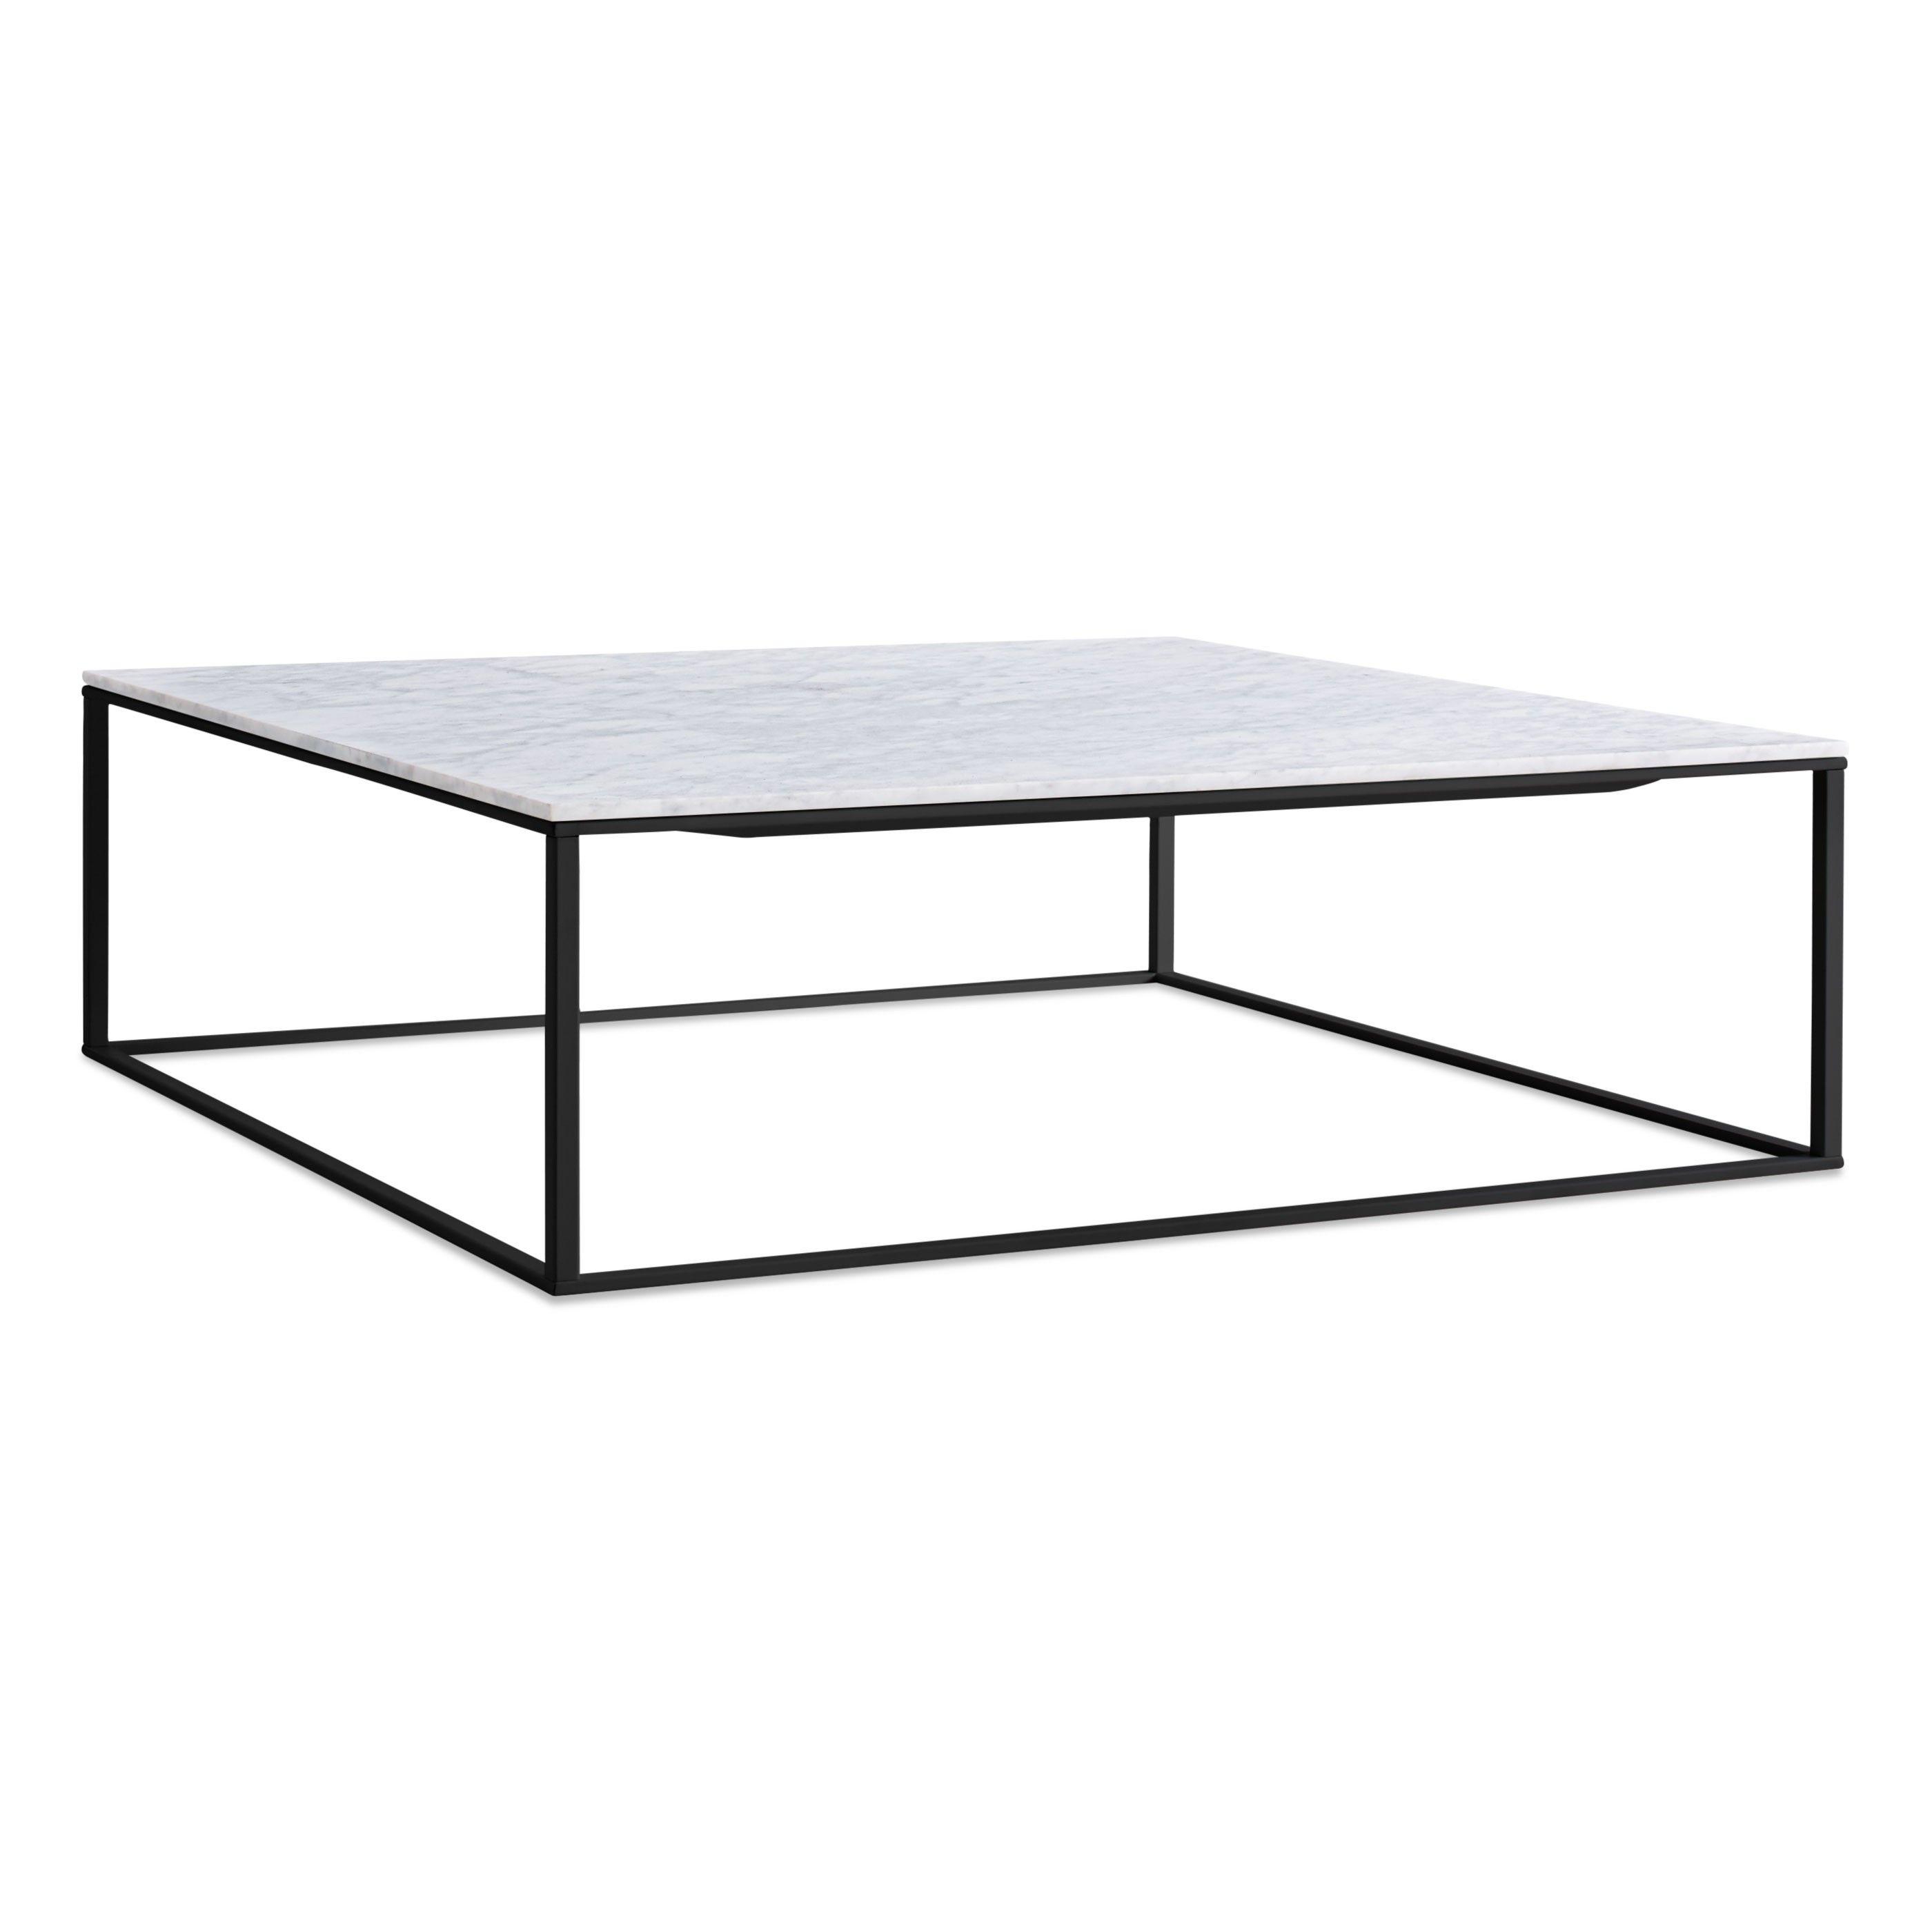 Minimalista Square Coffee Table Coffee Table Square Modern